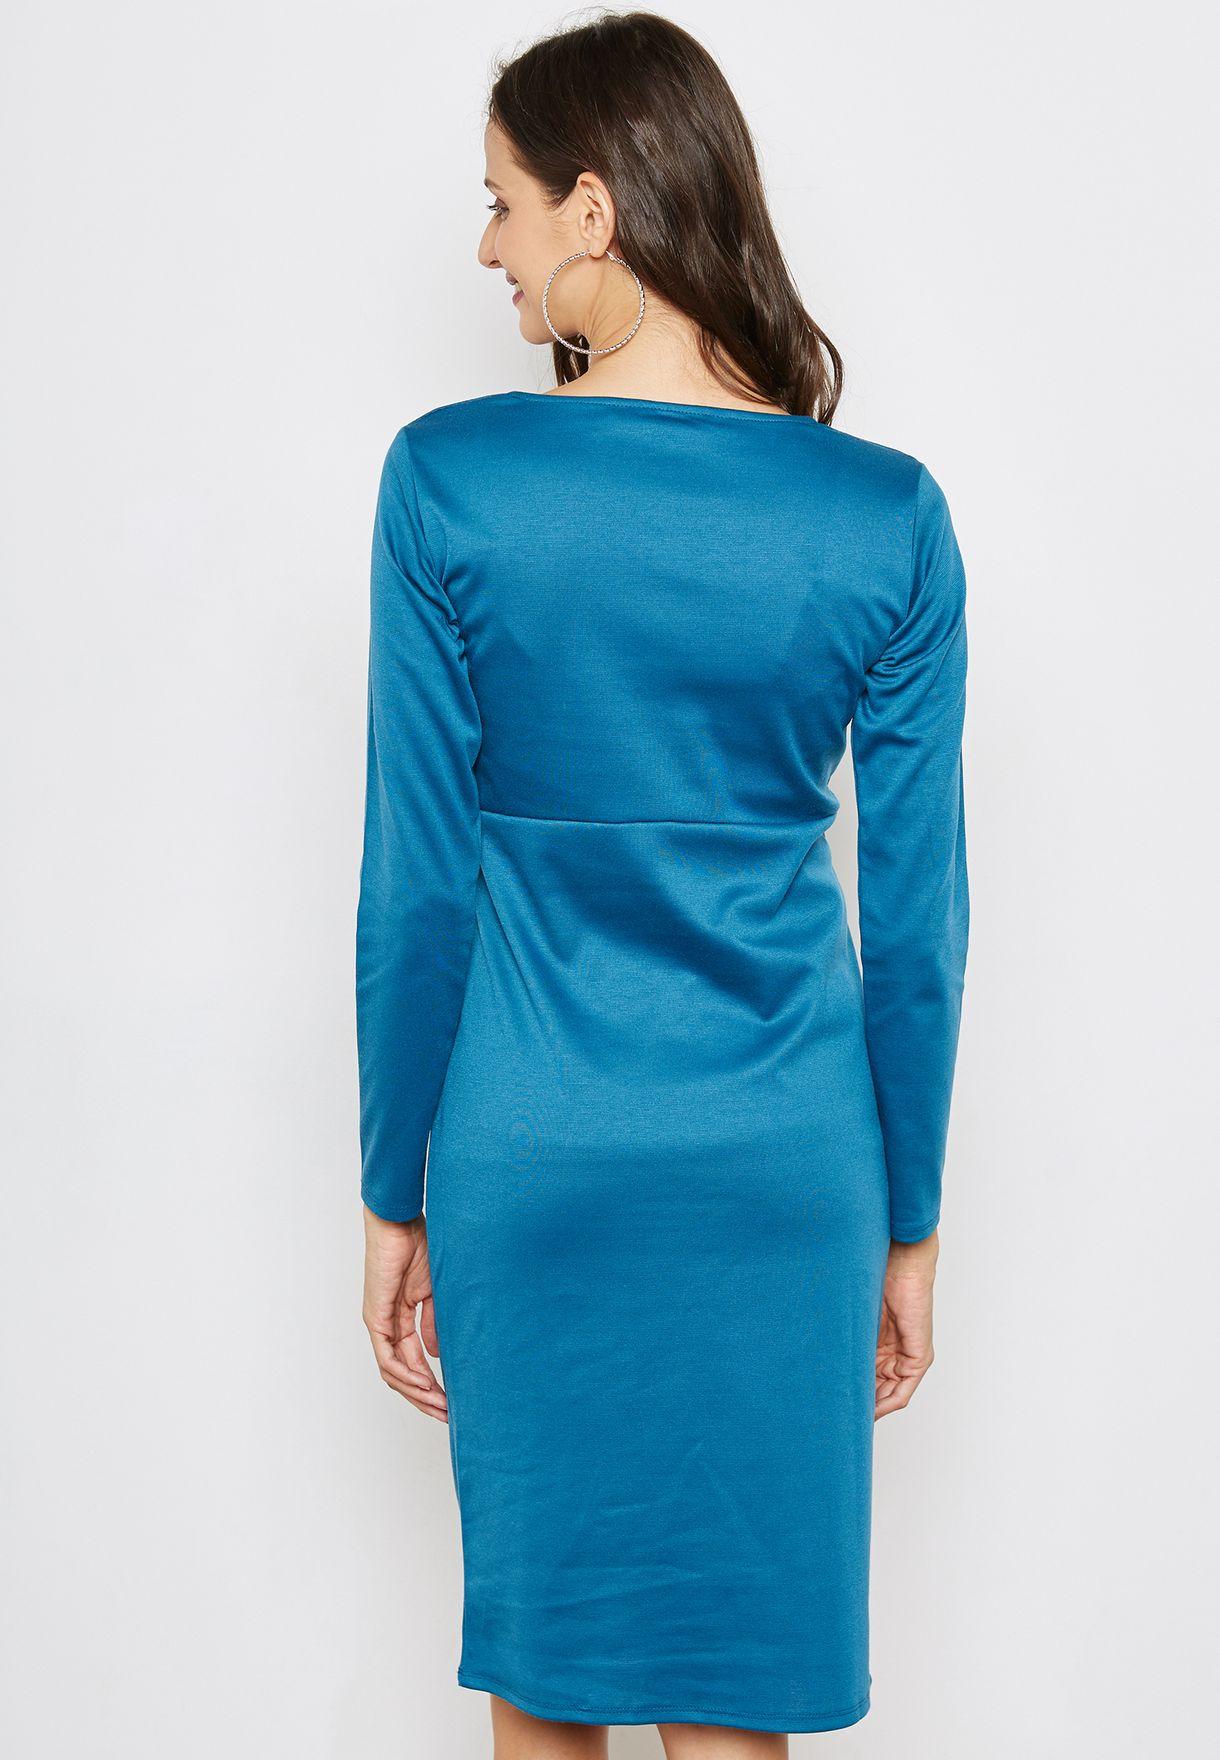 Twist Front Bodycon Dress